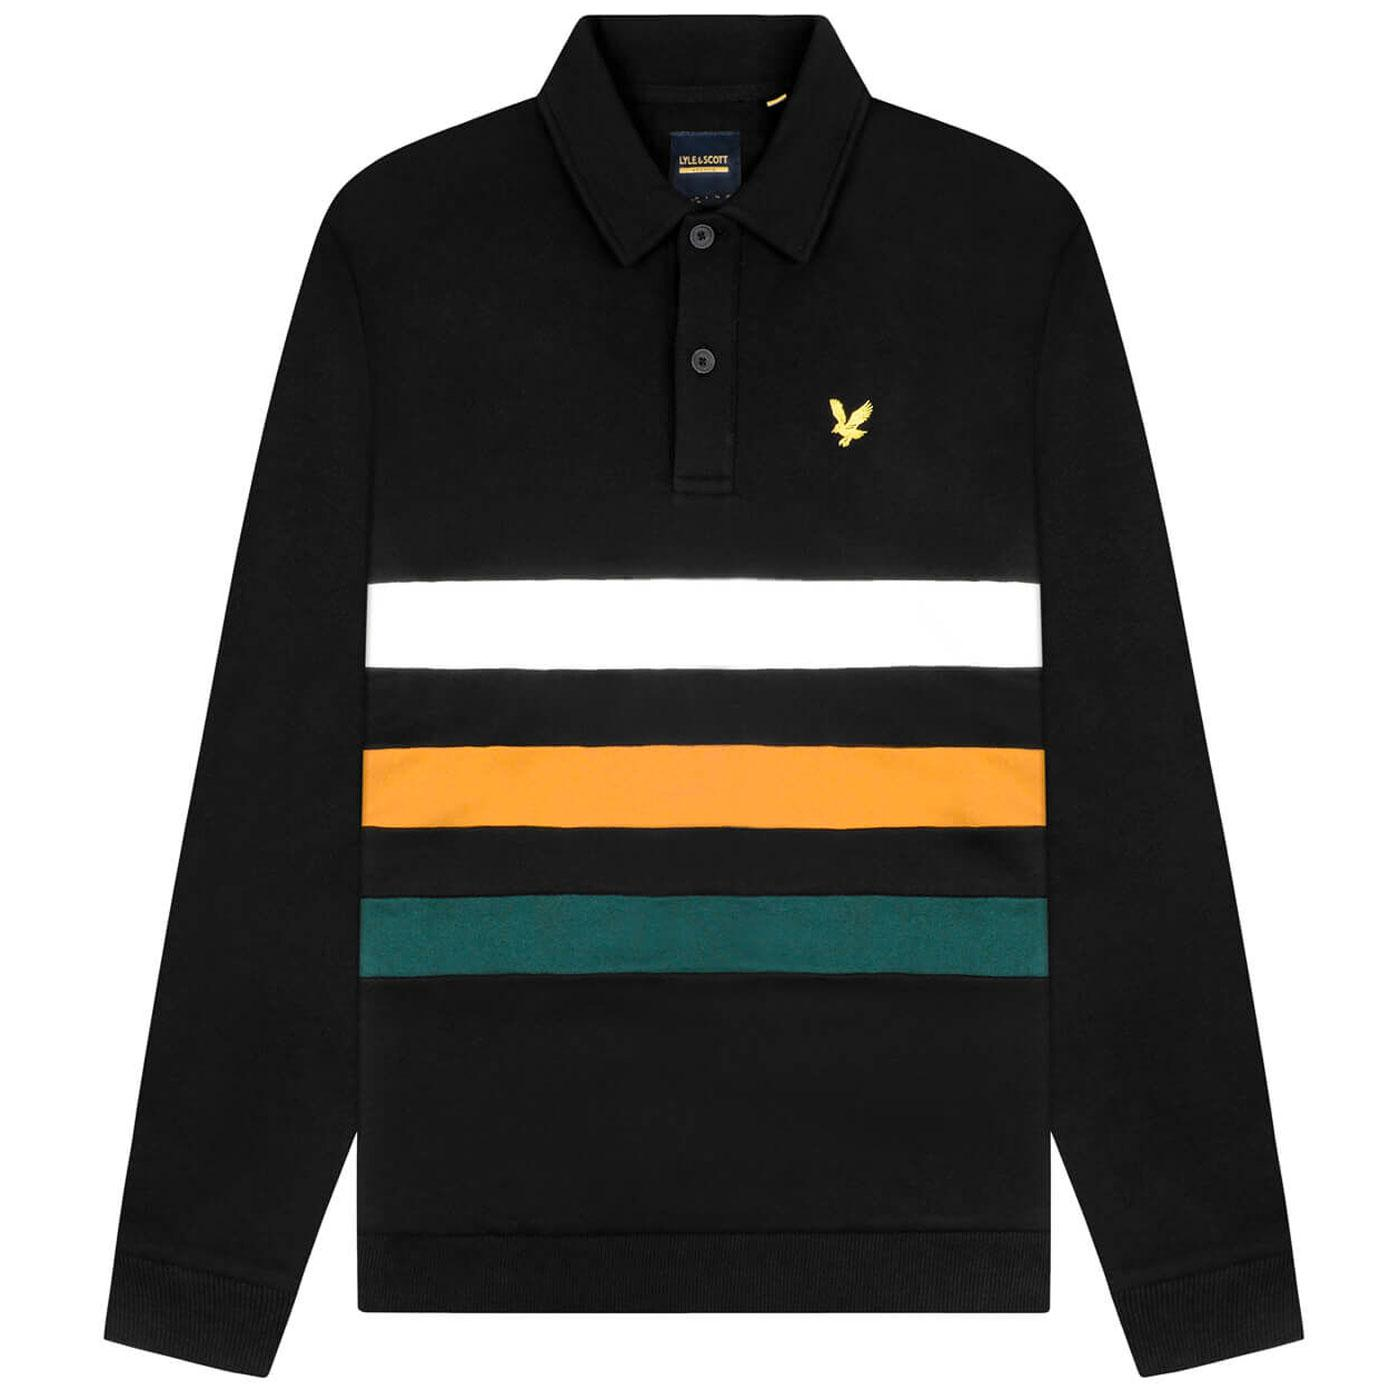 LYLE & SCOTT Retro 90s Cut & Sew Long Sleeve Polo